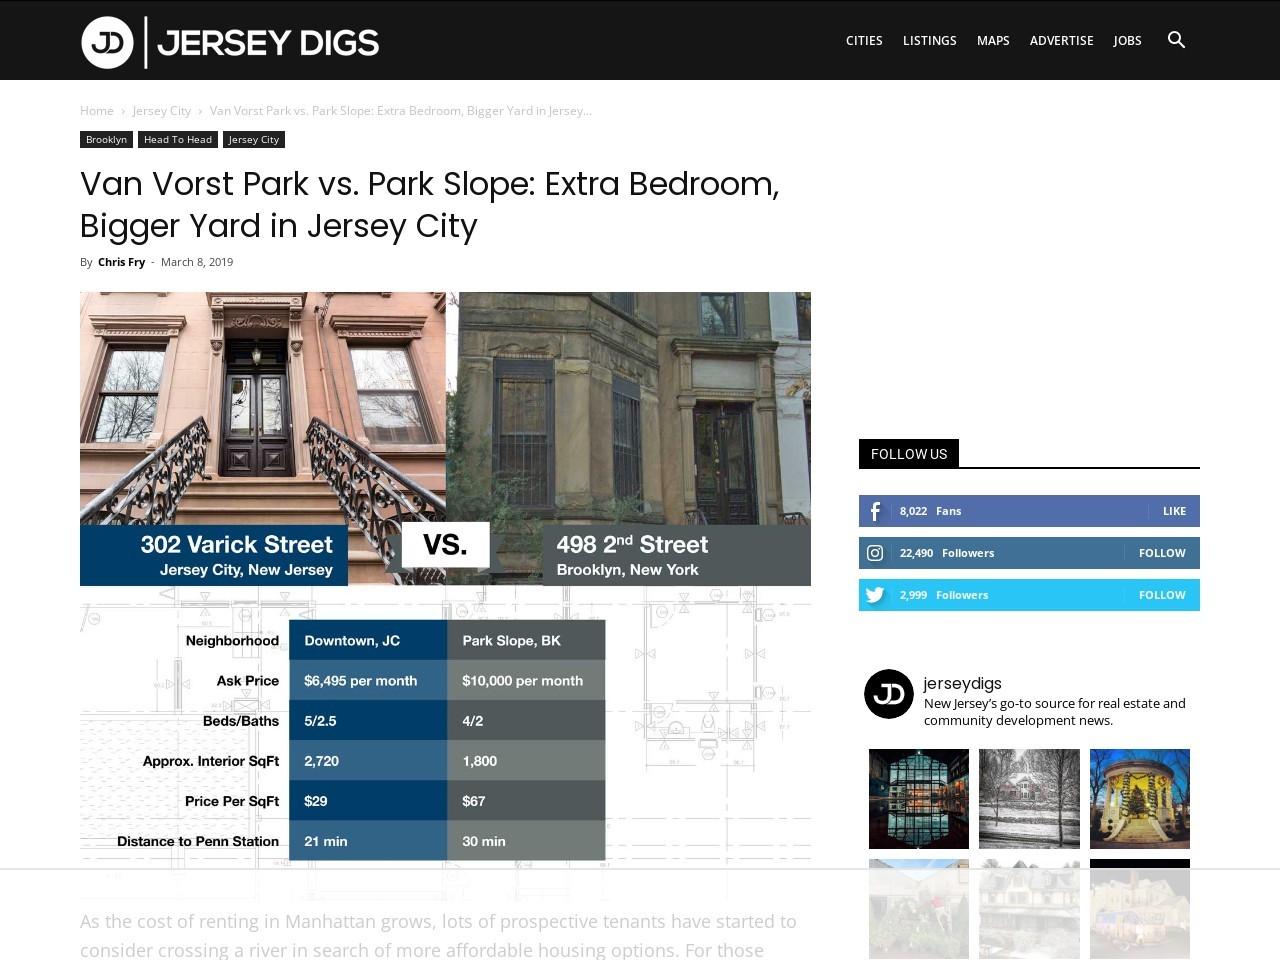 Van Vorst Park vs. Park Slope: Extra Bedroom, Bigger Yard in Jersey City